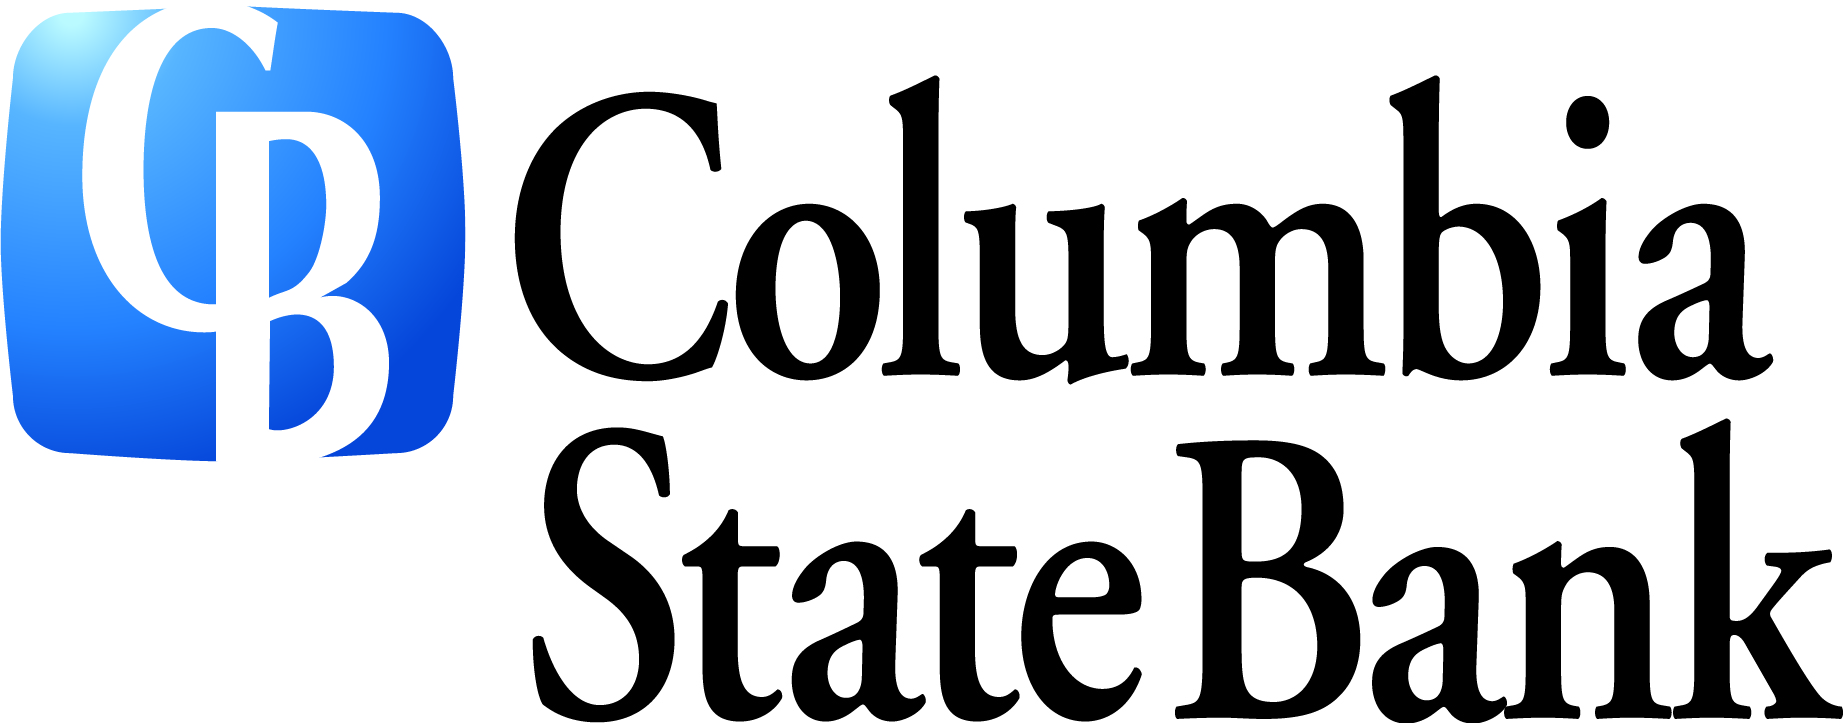 MemLogoSearch_Columbia State bank.jpg